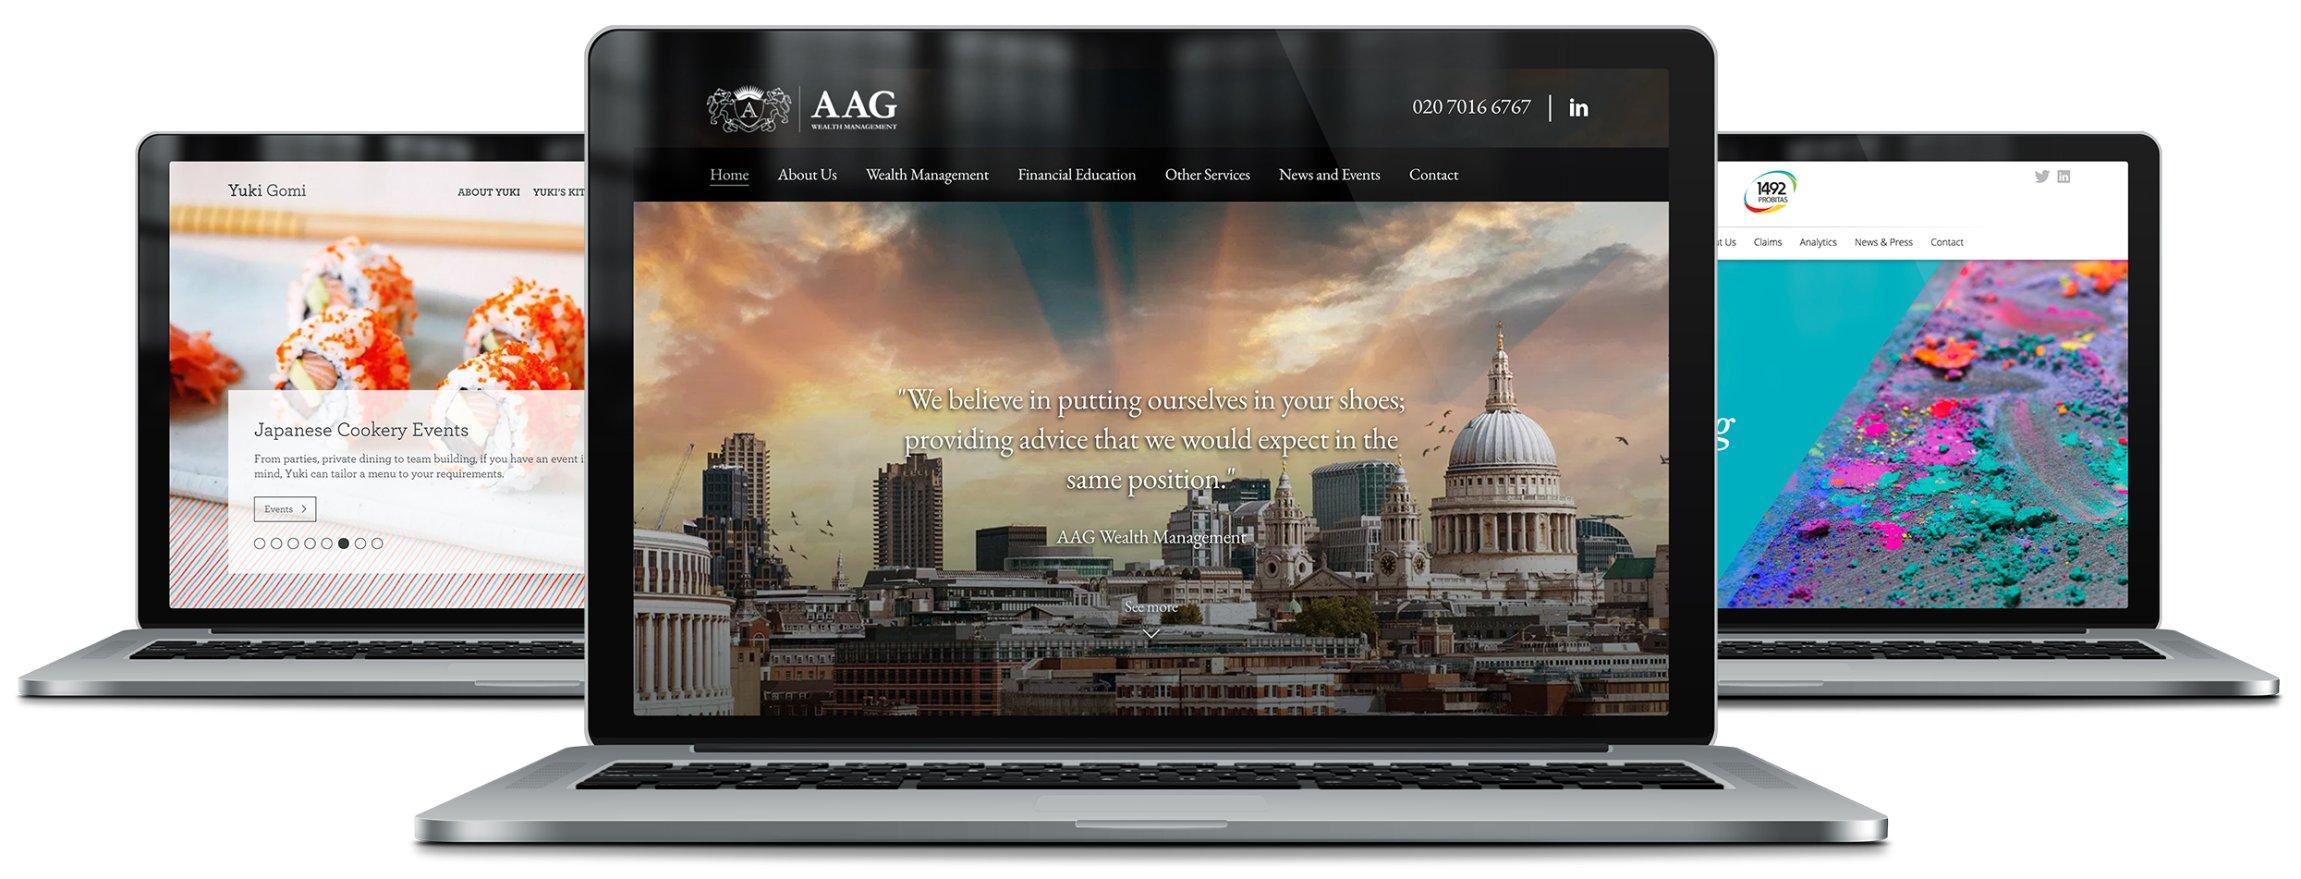 Web Design London Highscore